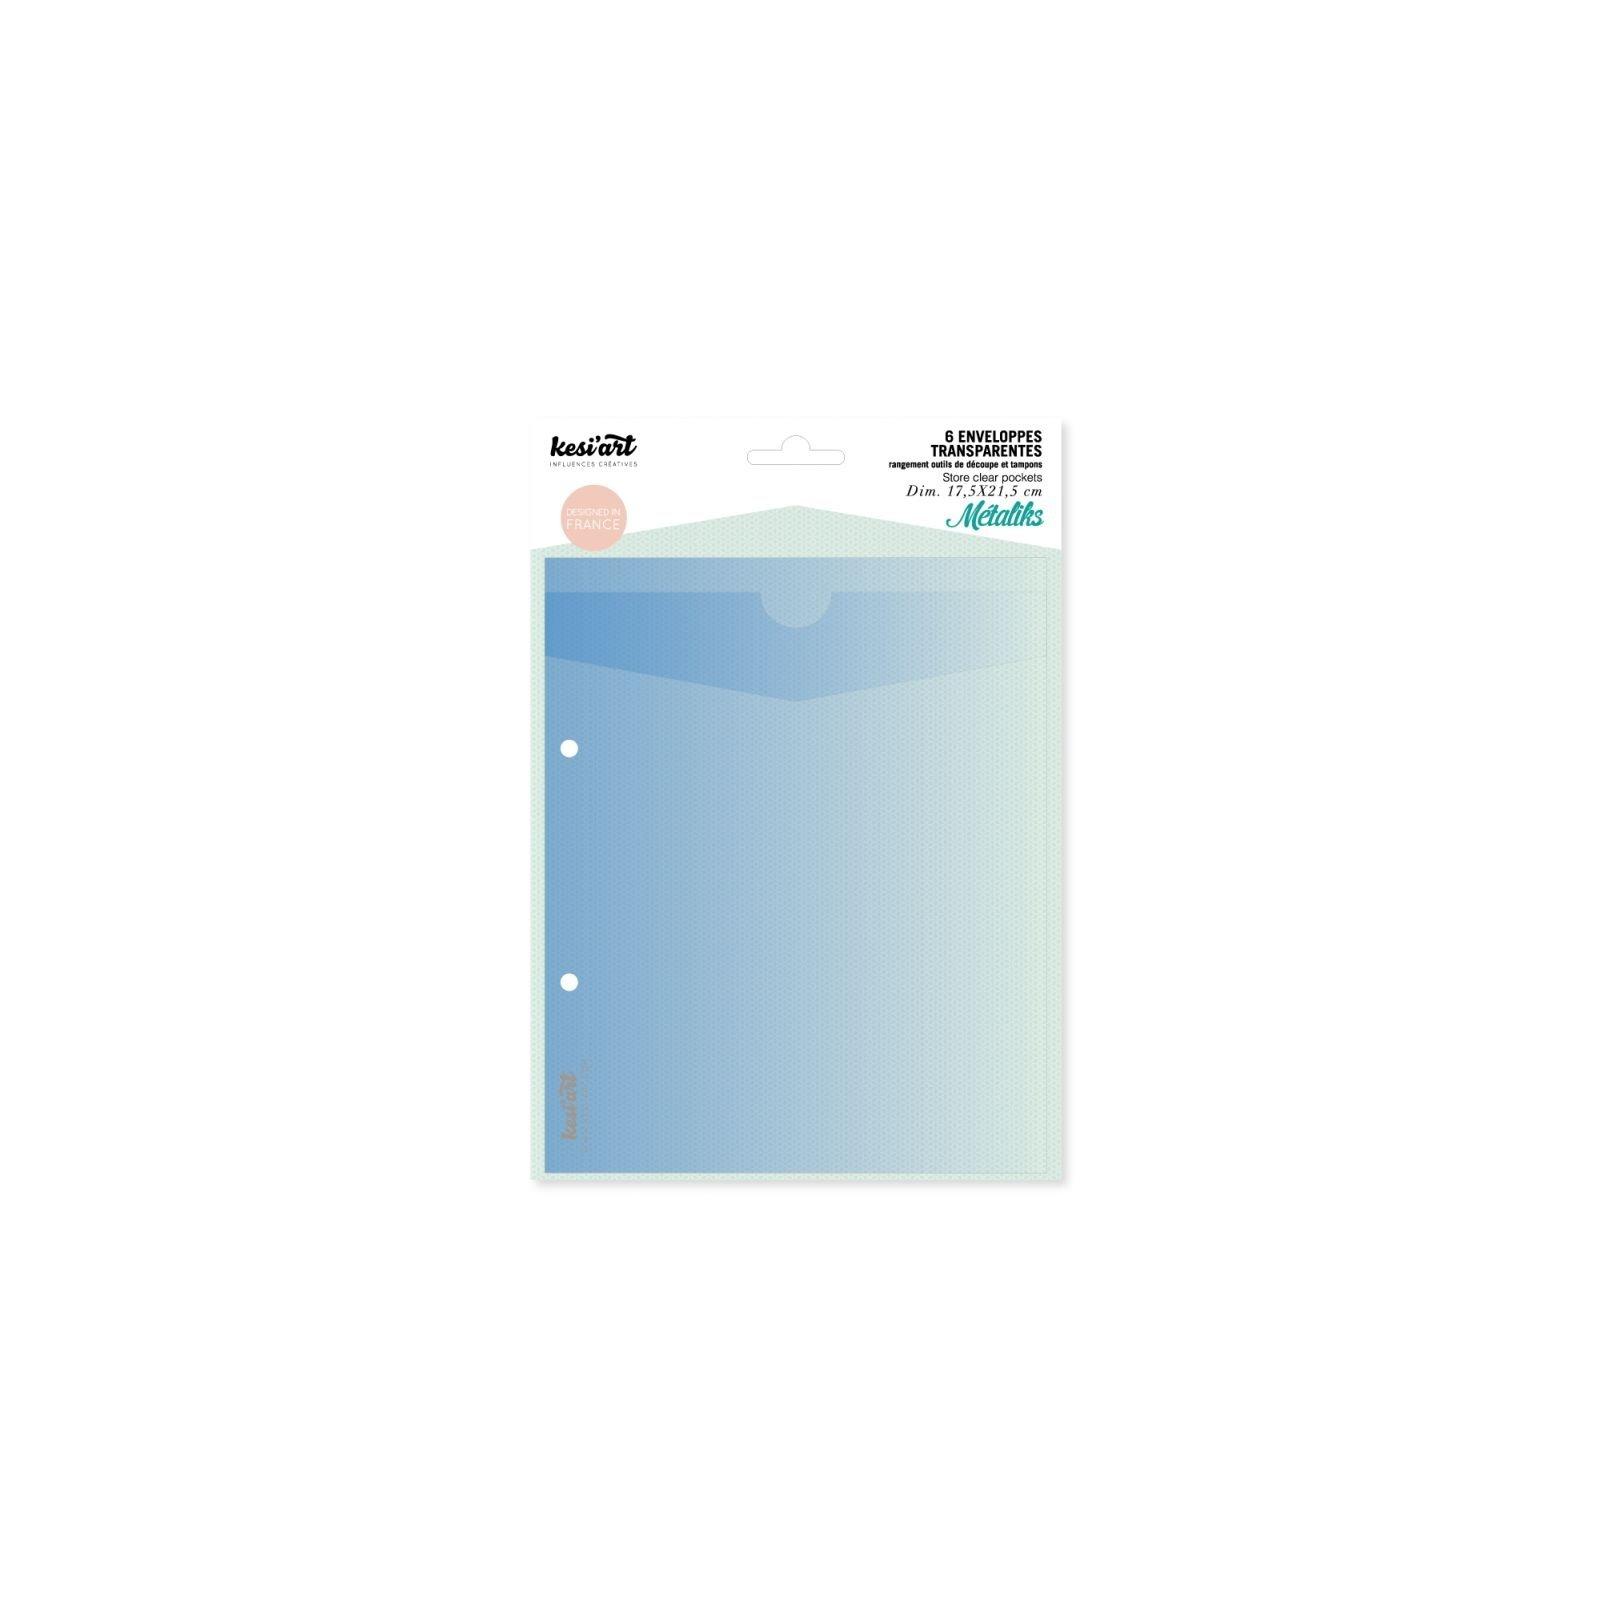 Enveloppes transparentes de rangement - Kesi'art